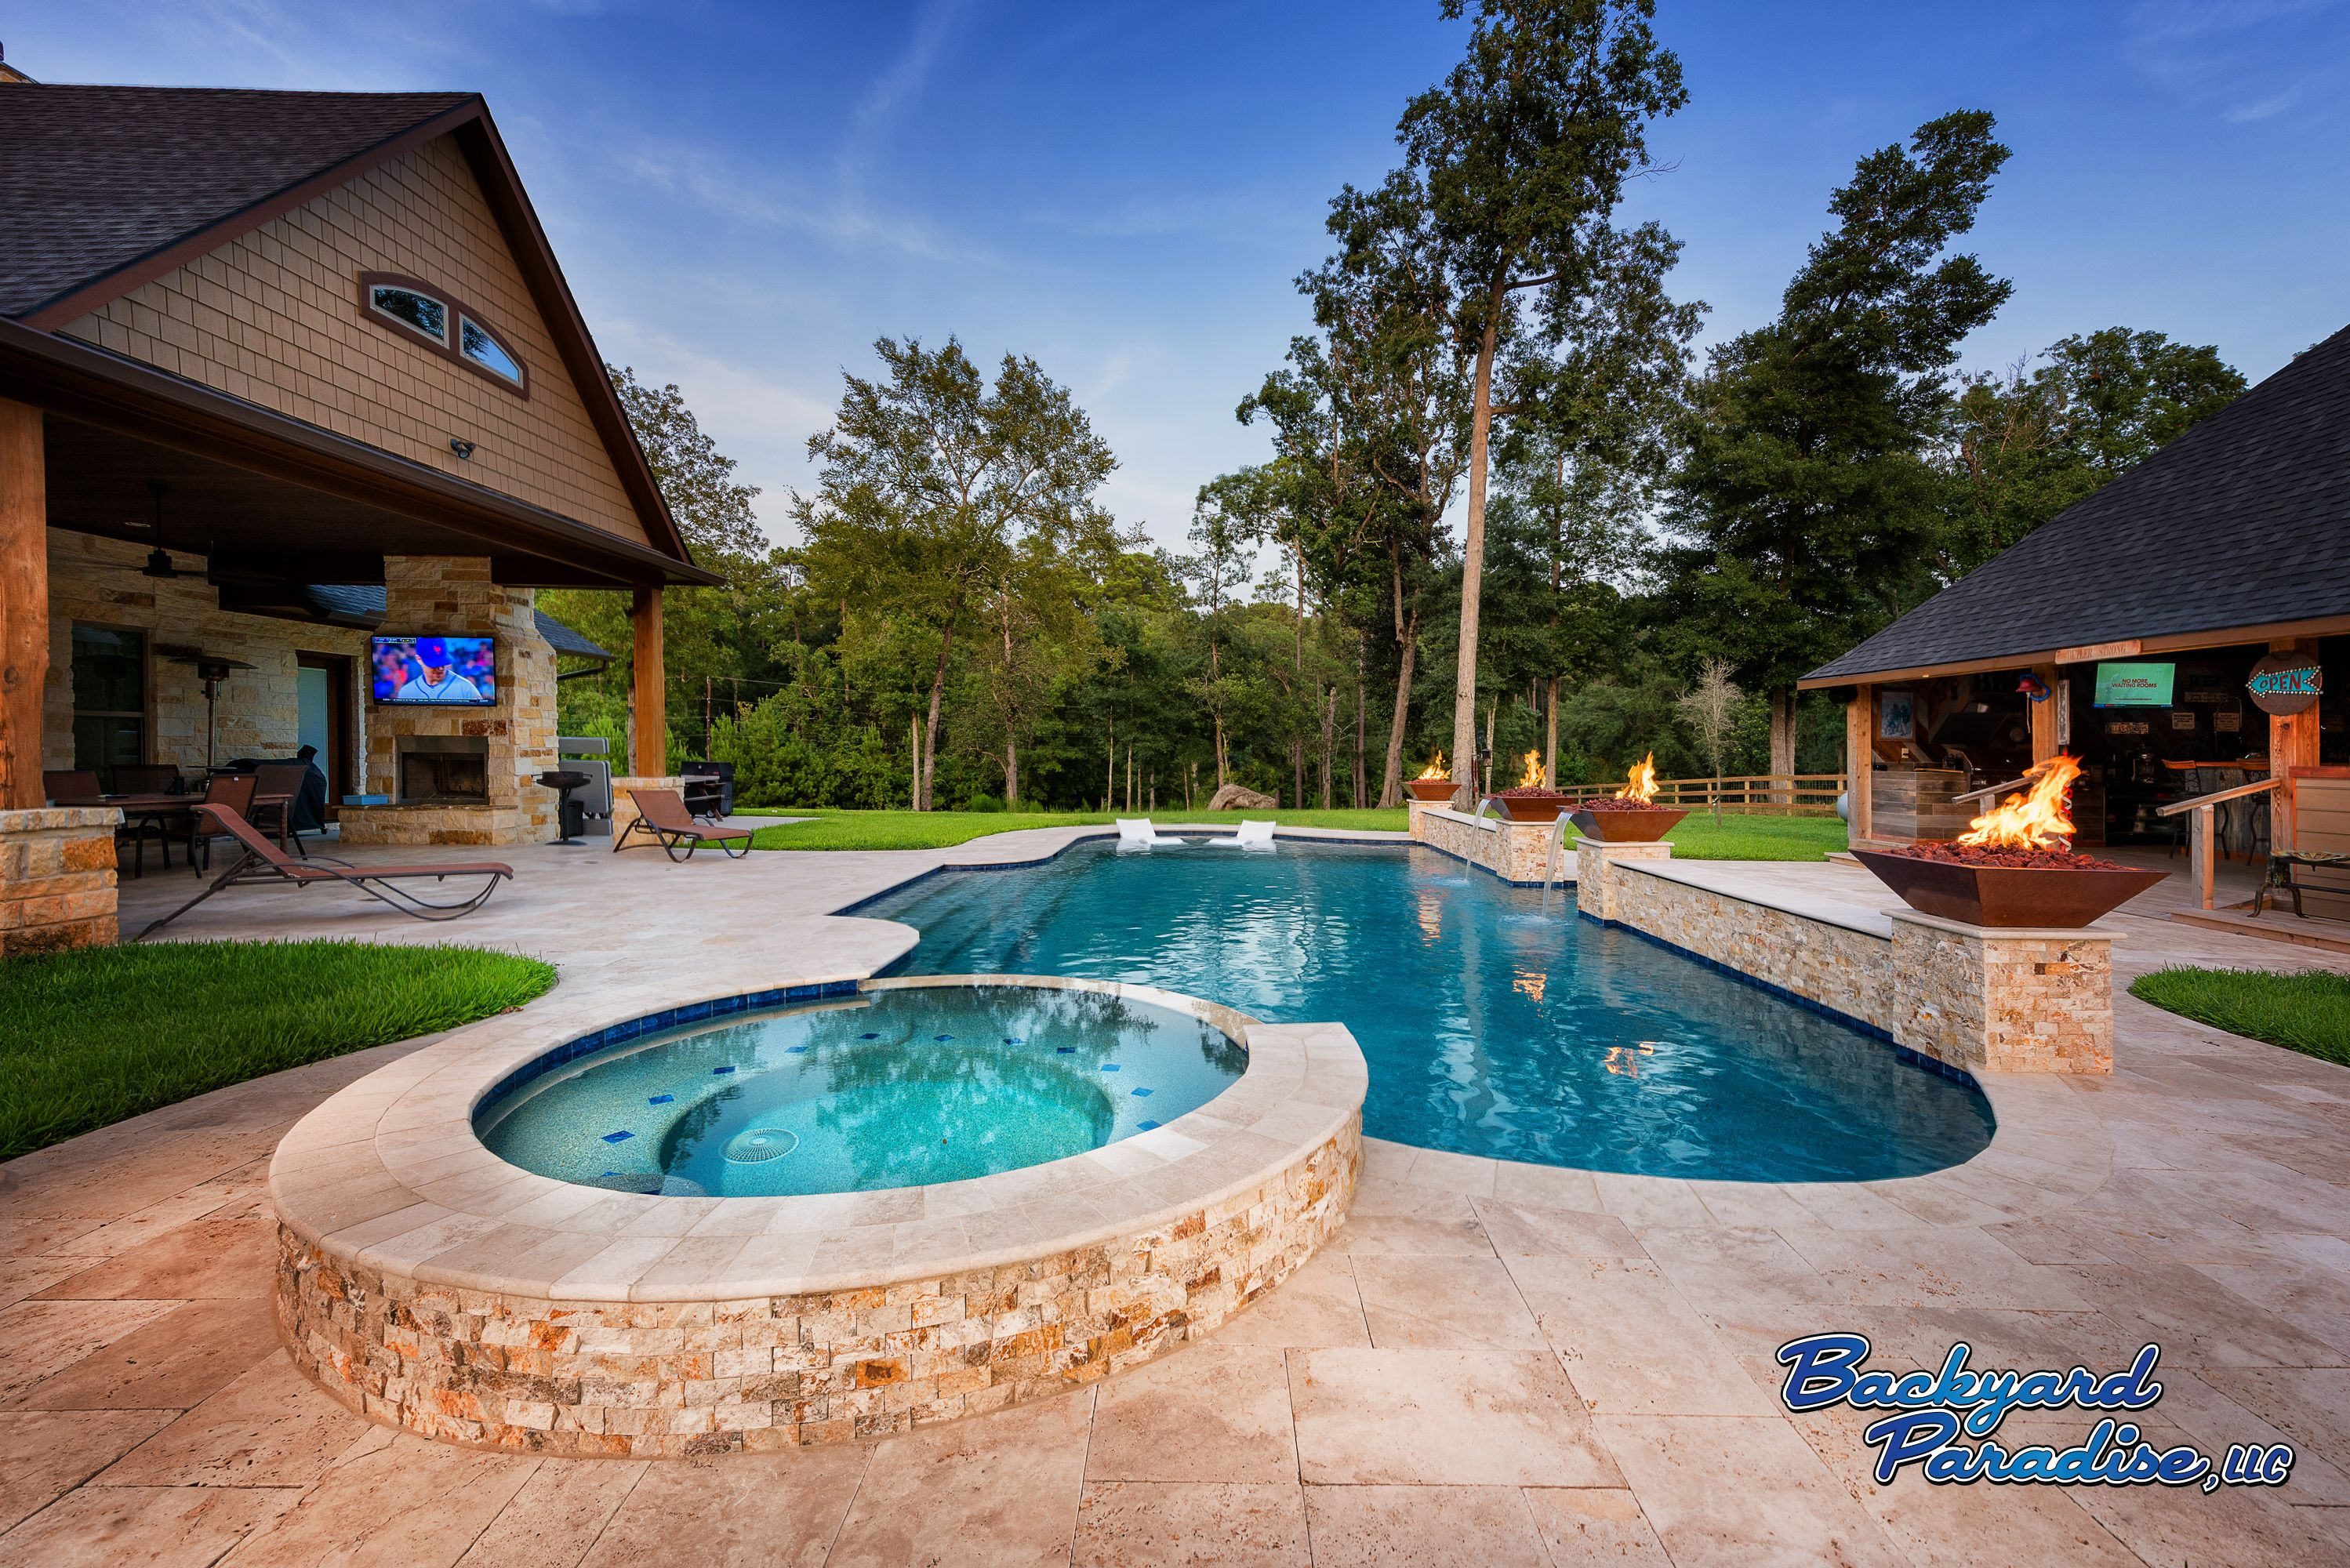 Pin By Backyard Paradise Pools Pati On Luxury Swimming Pools Luxury Swimming Pools Pool Patio Paradise Pools